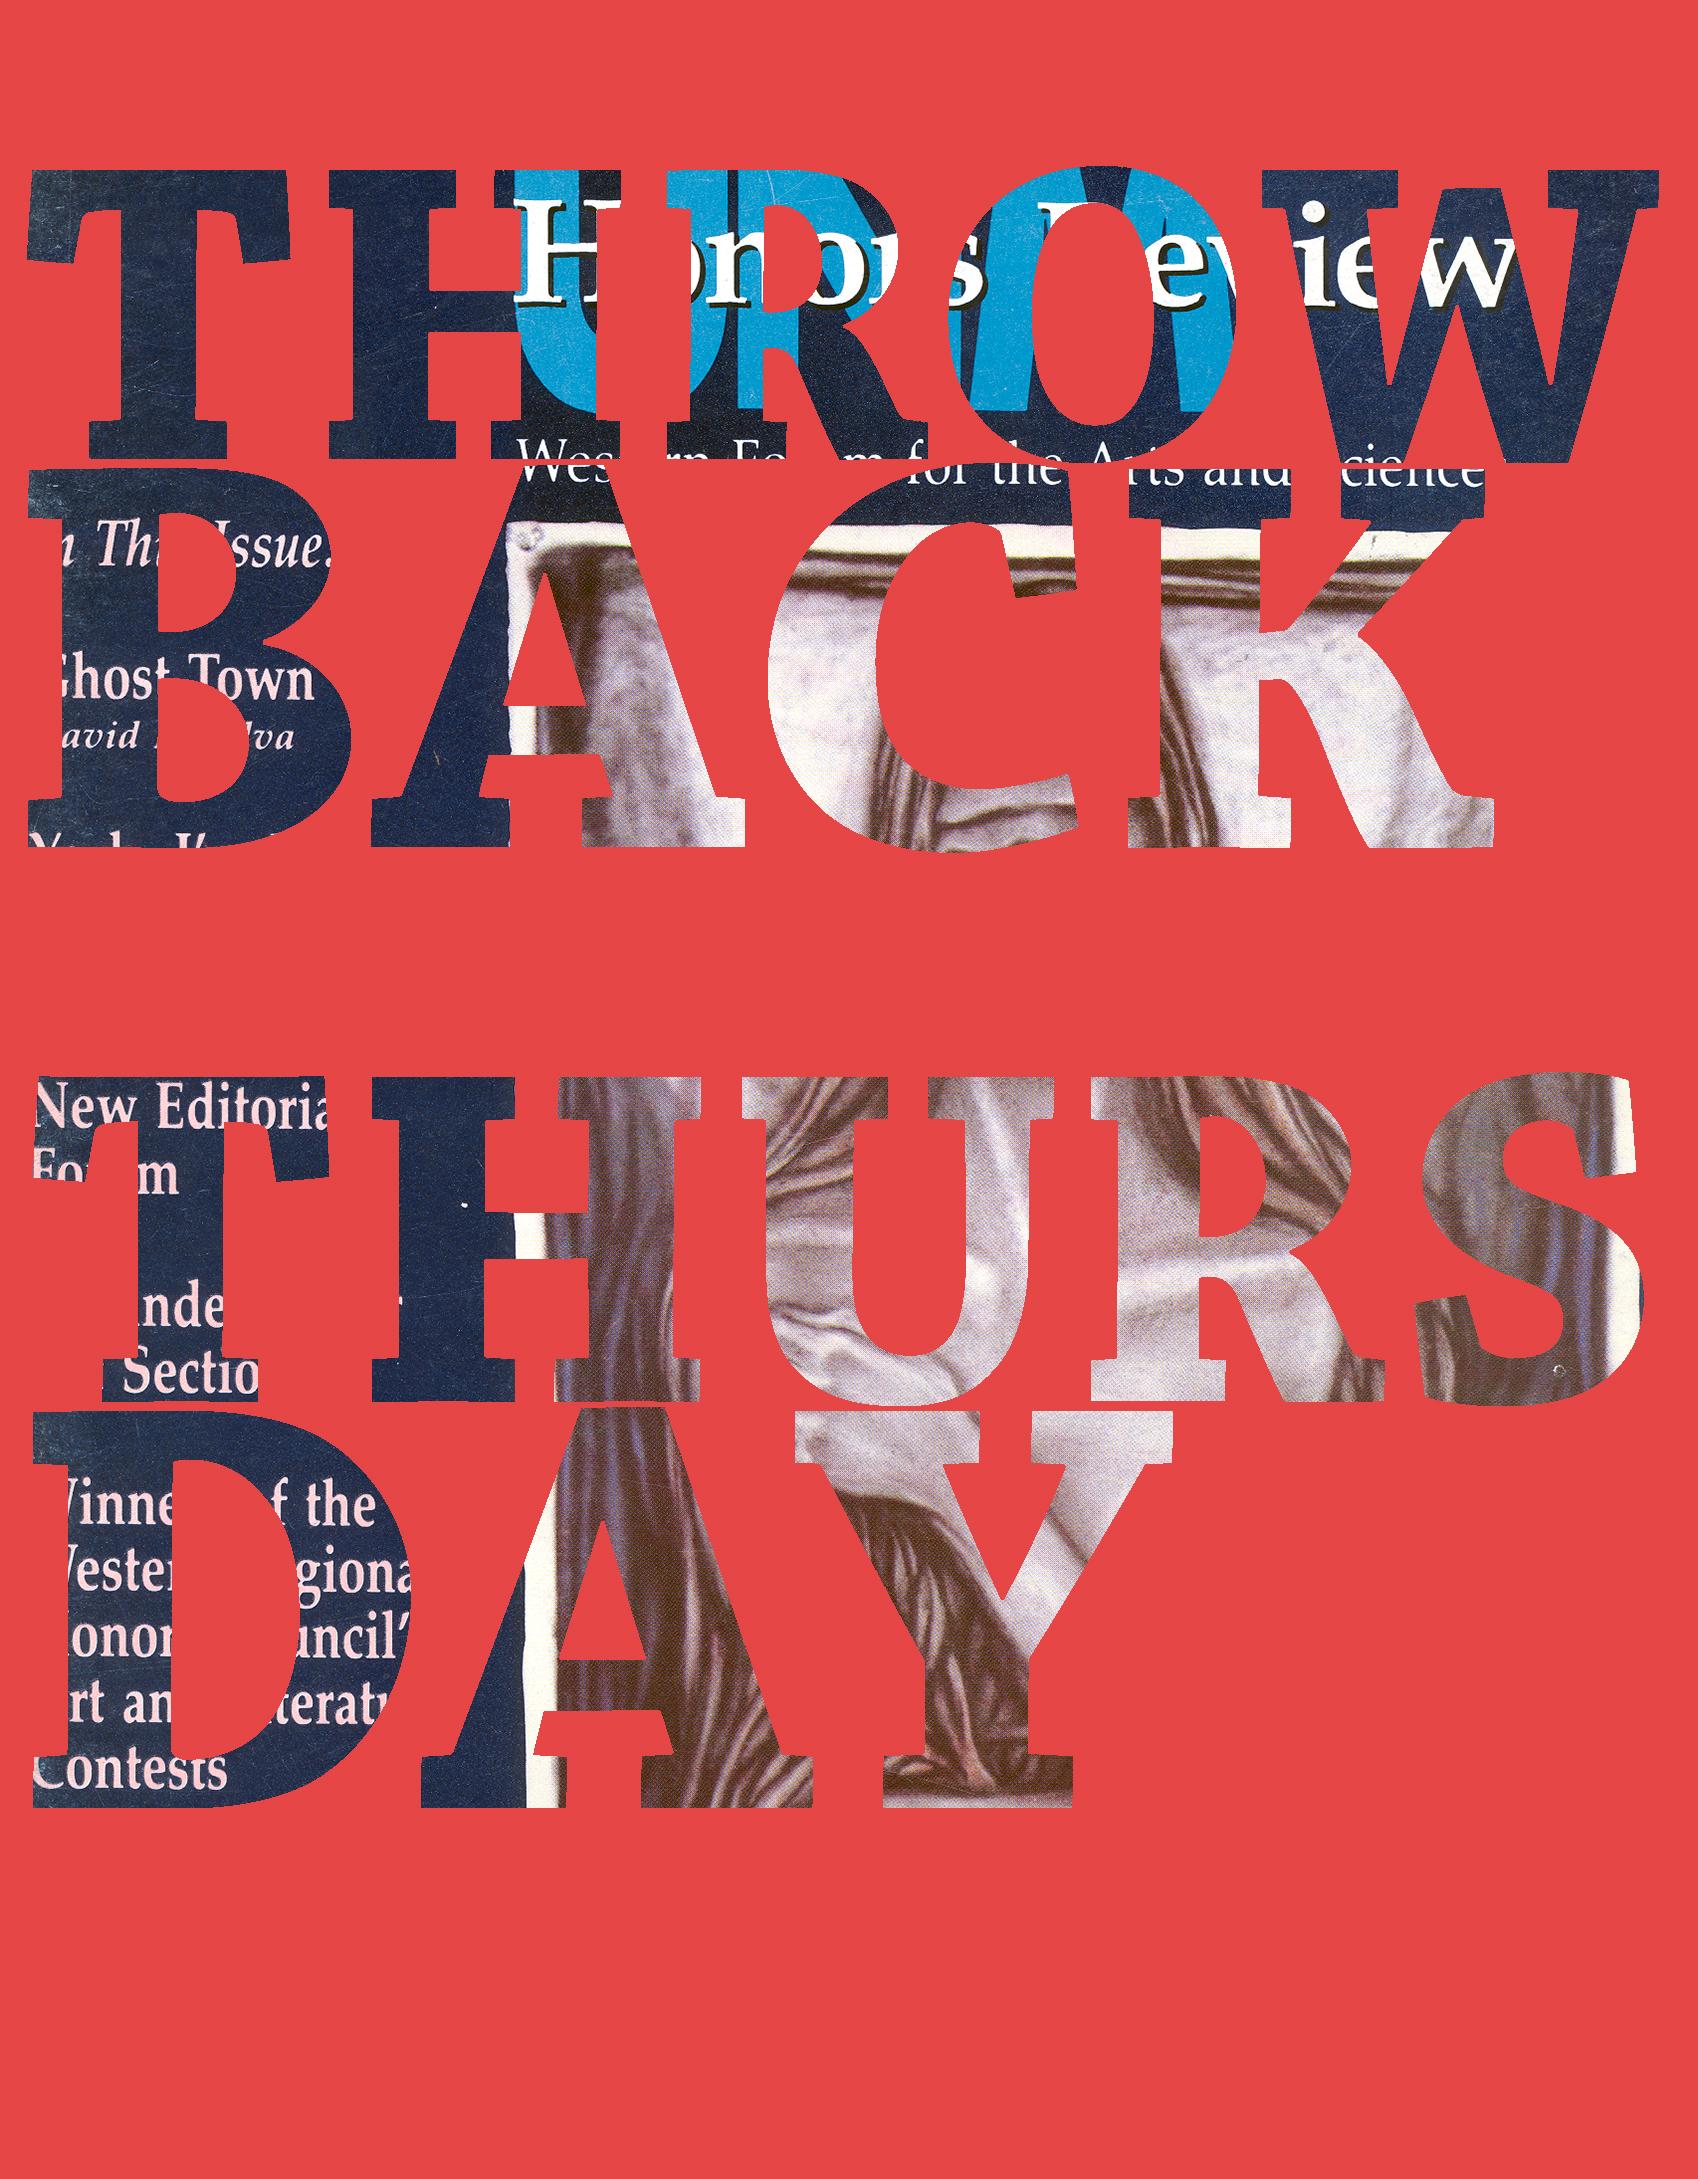 Throwback Thurdsay